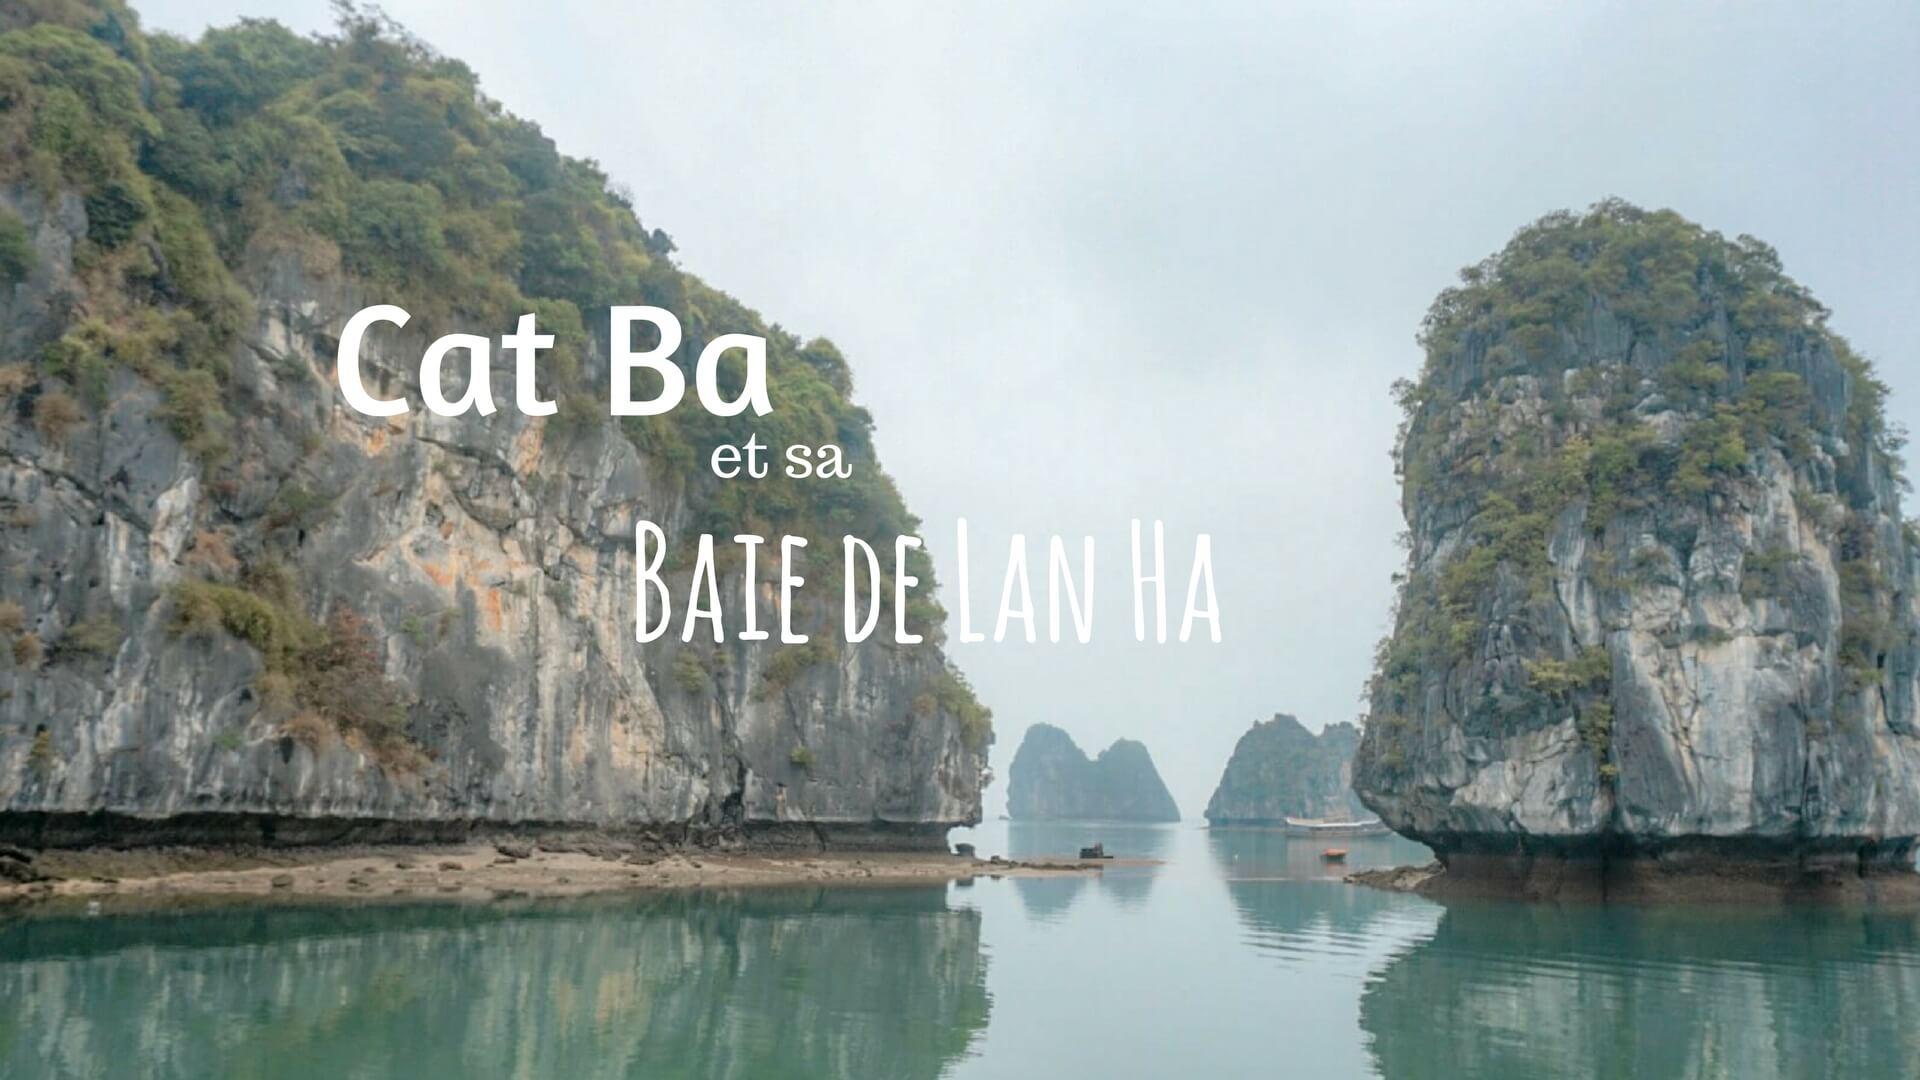 Lan Ha Baie Cat Ba Vietnam